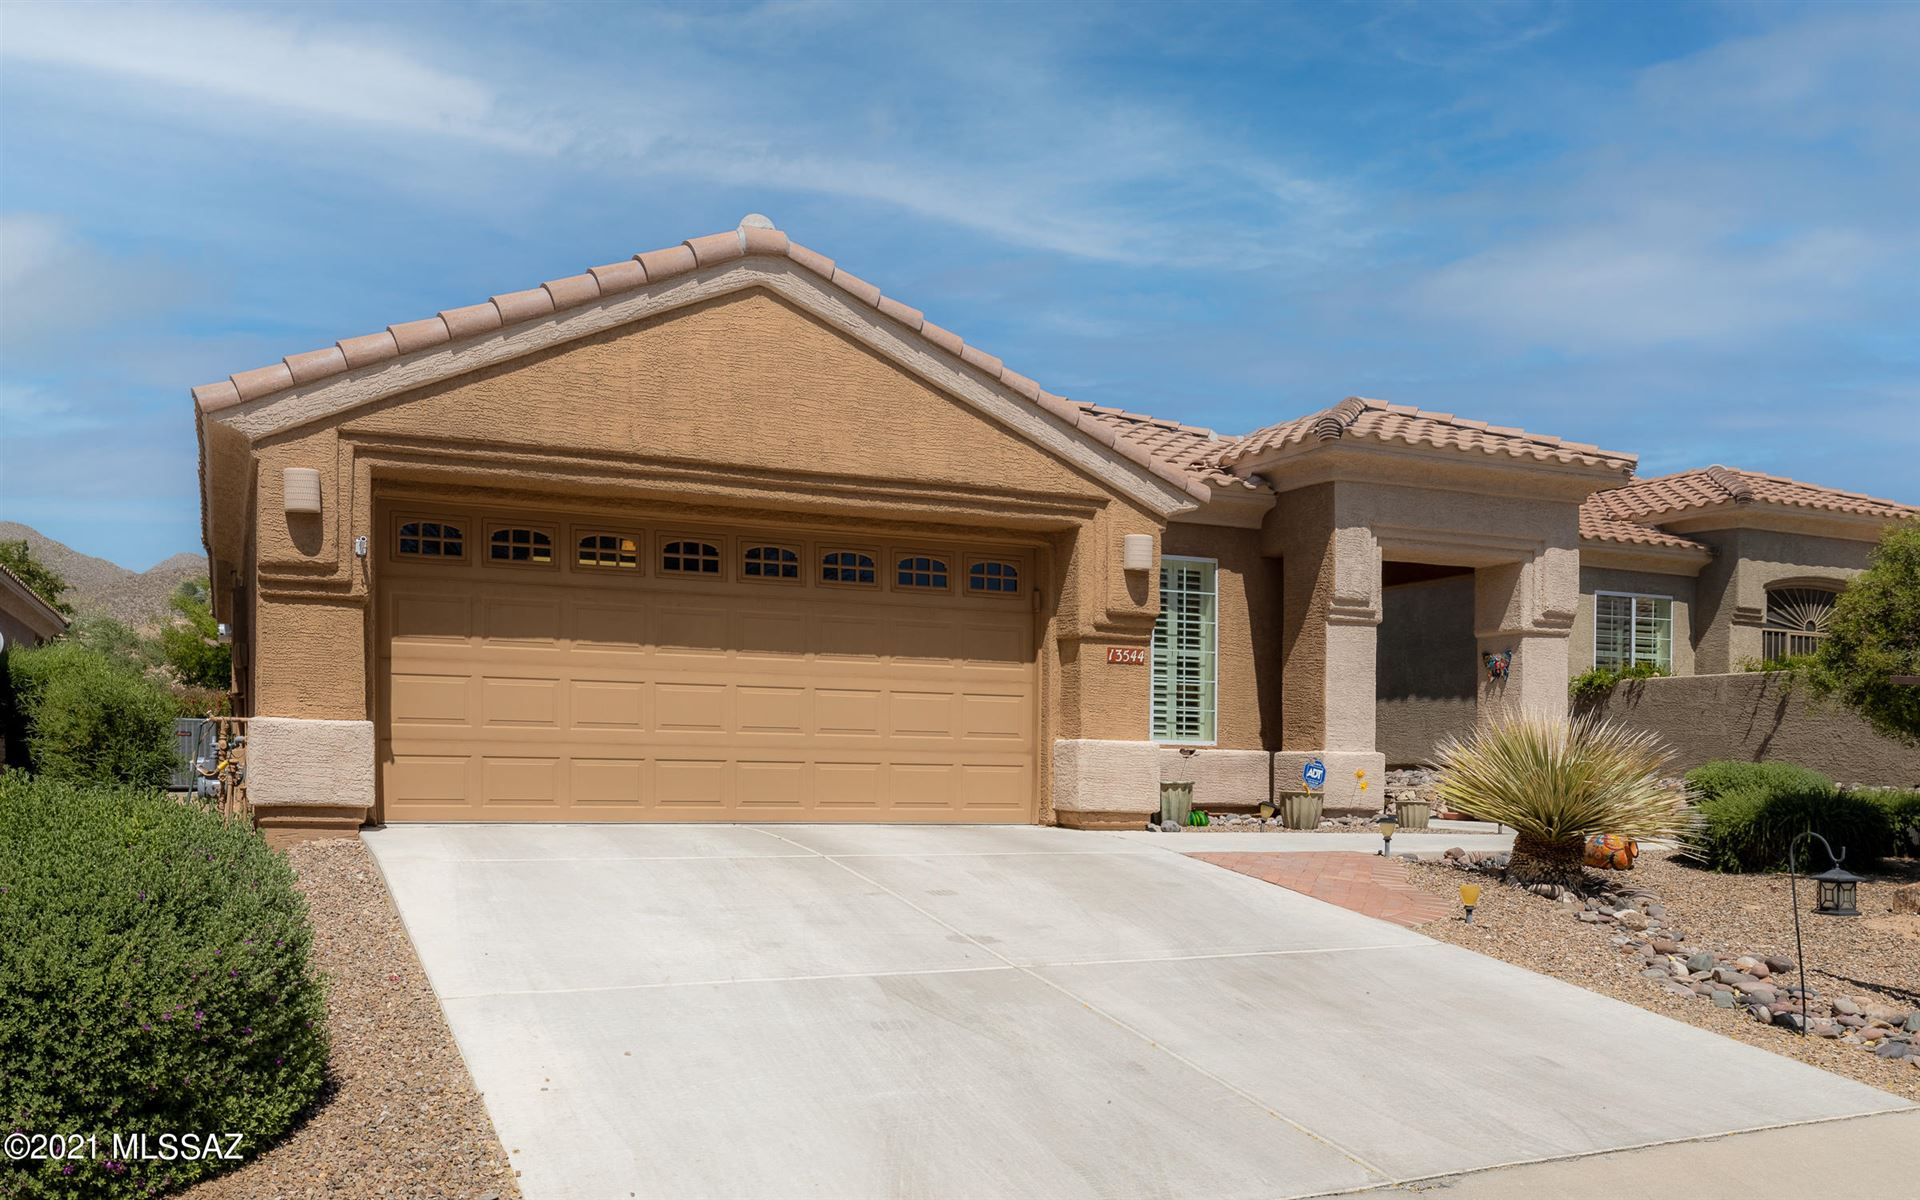 13544 N Buckhorn Cholla Drive, Marana, AZ 85658 - MLS#: 22110381